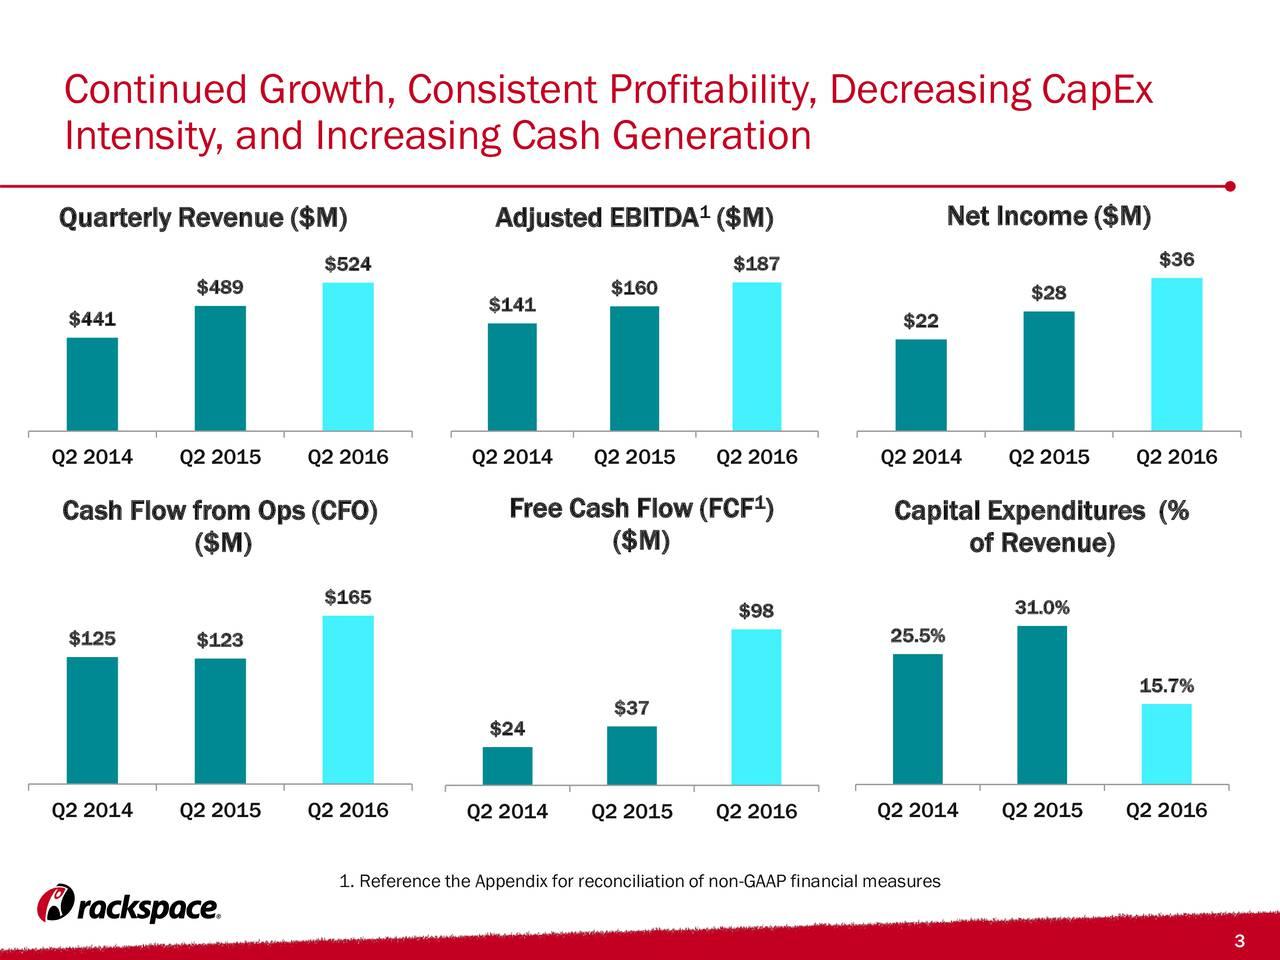 Intensity, and Increasing Cash Generation Quarterly Revenue ($M) Adjusted EBITDA ($M) Net Income ($M) $524 $187 $36 $489 $160 $28 $141 $441 $22 Q2 2014 Q2 2015 Q2 2016 Q2 2014 Q2 2015 Q2 2016 Q2 2014 Q2 2015 Q2 2016 Cash Flow from Ops (CFO) Free Cash Flow (FCF )1 Capital Expenditures (% ($M) ($M) of Revenue) $165 31.0% $98 $125 $123 25.5% 15.7% $37 $24 Q2 2014 Q2 2015 Q2 2016 Q2 2014 Q2 2015 Q2 2016 Q2 2014 Q2 2015 Q2 2016 1. Reference the Appendix for reconciliation of non-GAAP financial measures 3